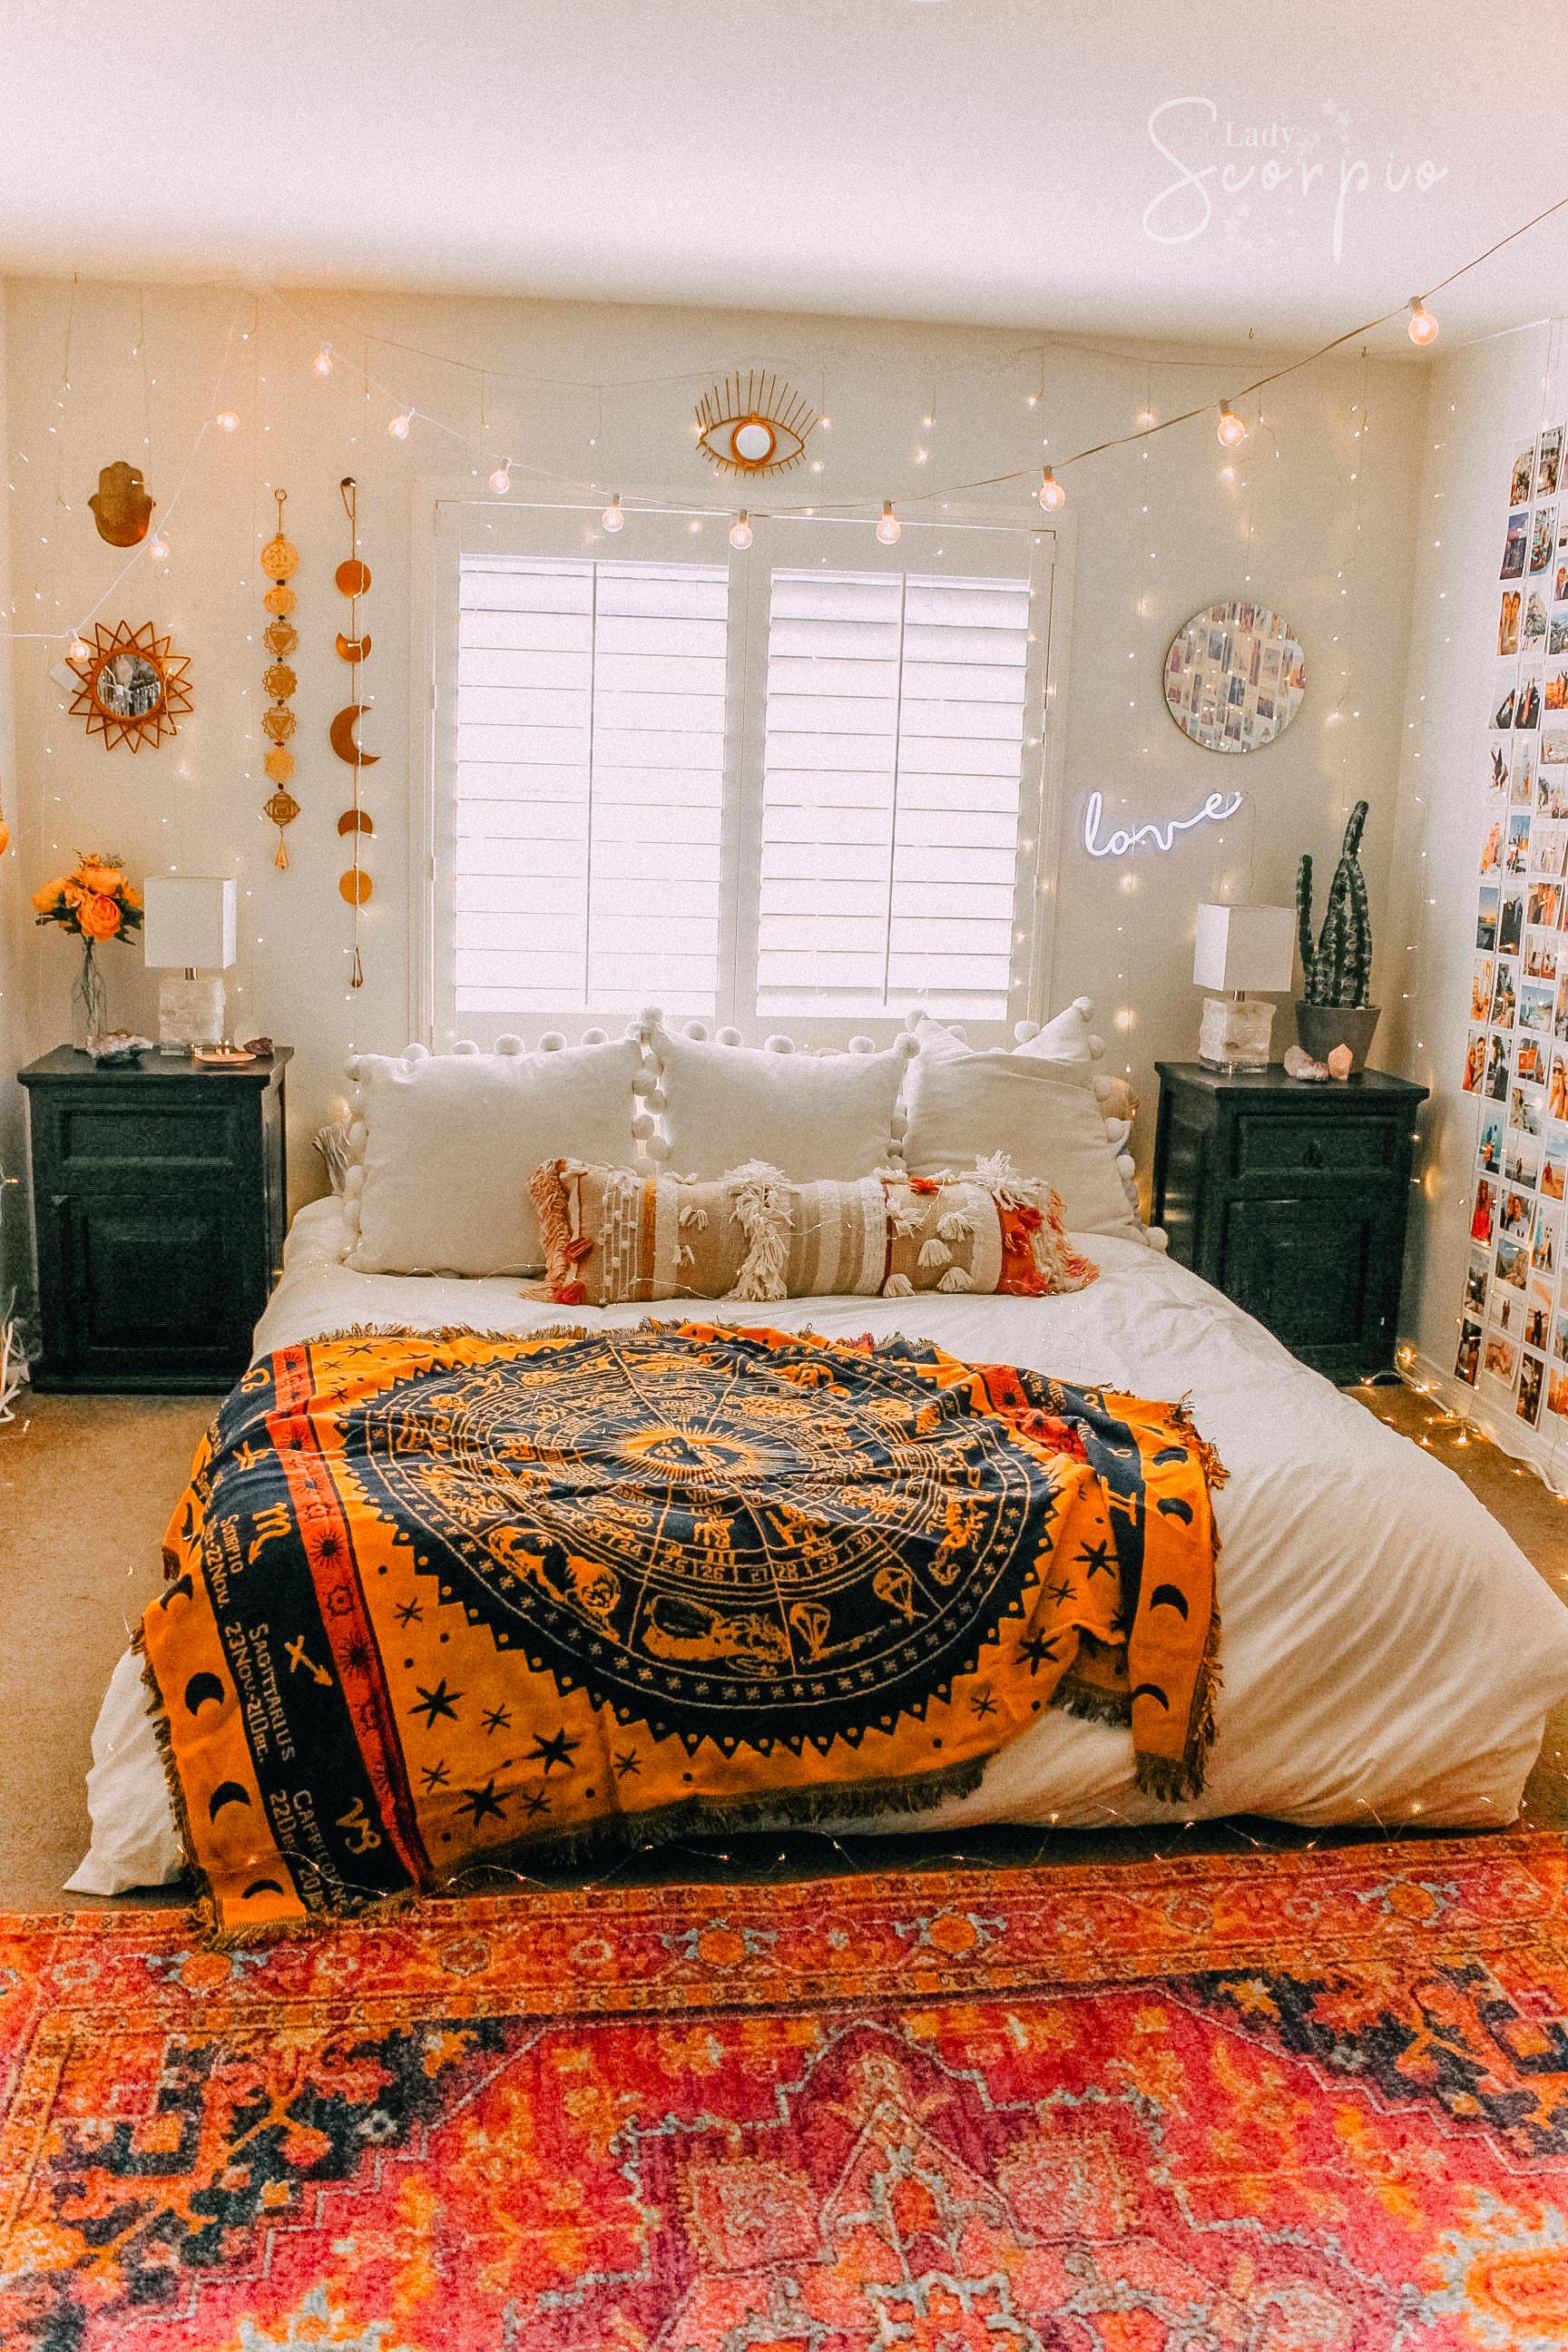 Zodiac Wheel Blanket Aesthetic Bedroom Aesthetic Room Decor